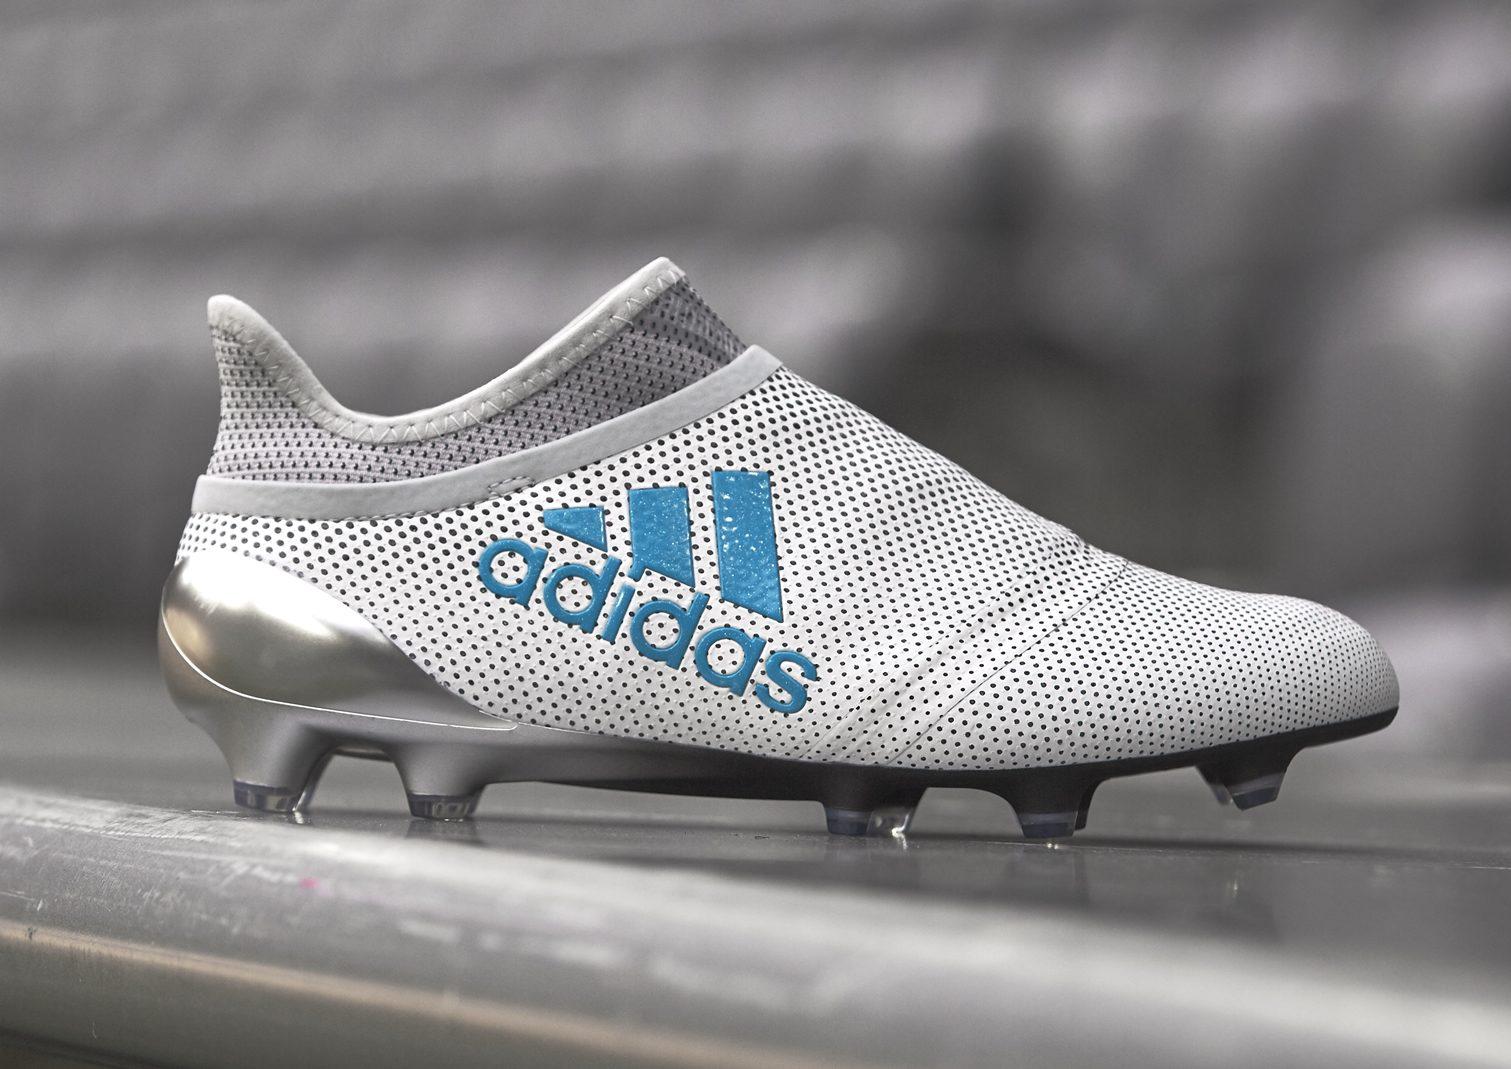 Botines Adidas Blancos 2017 Adidas Carbon Footprint  2f2de0f9d6f